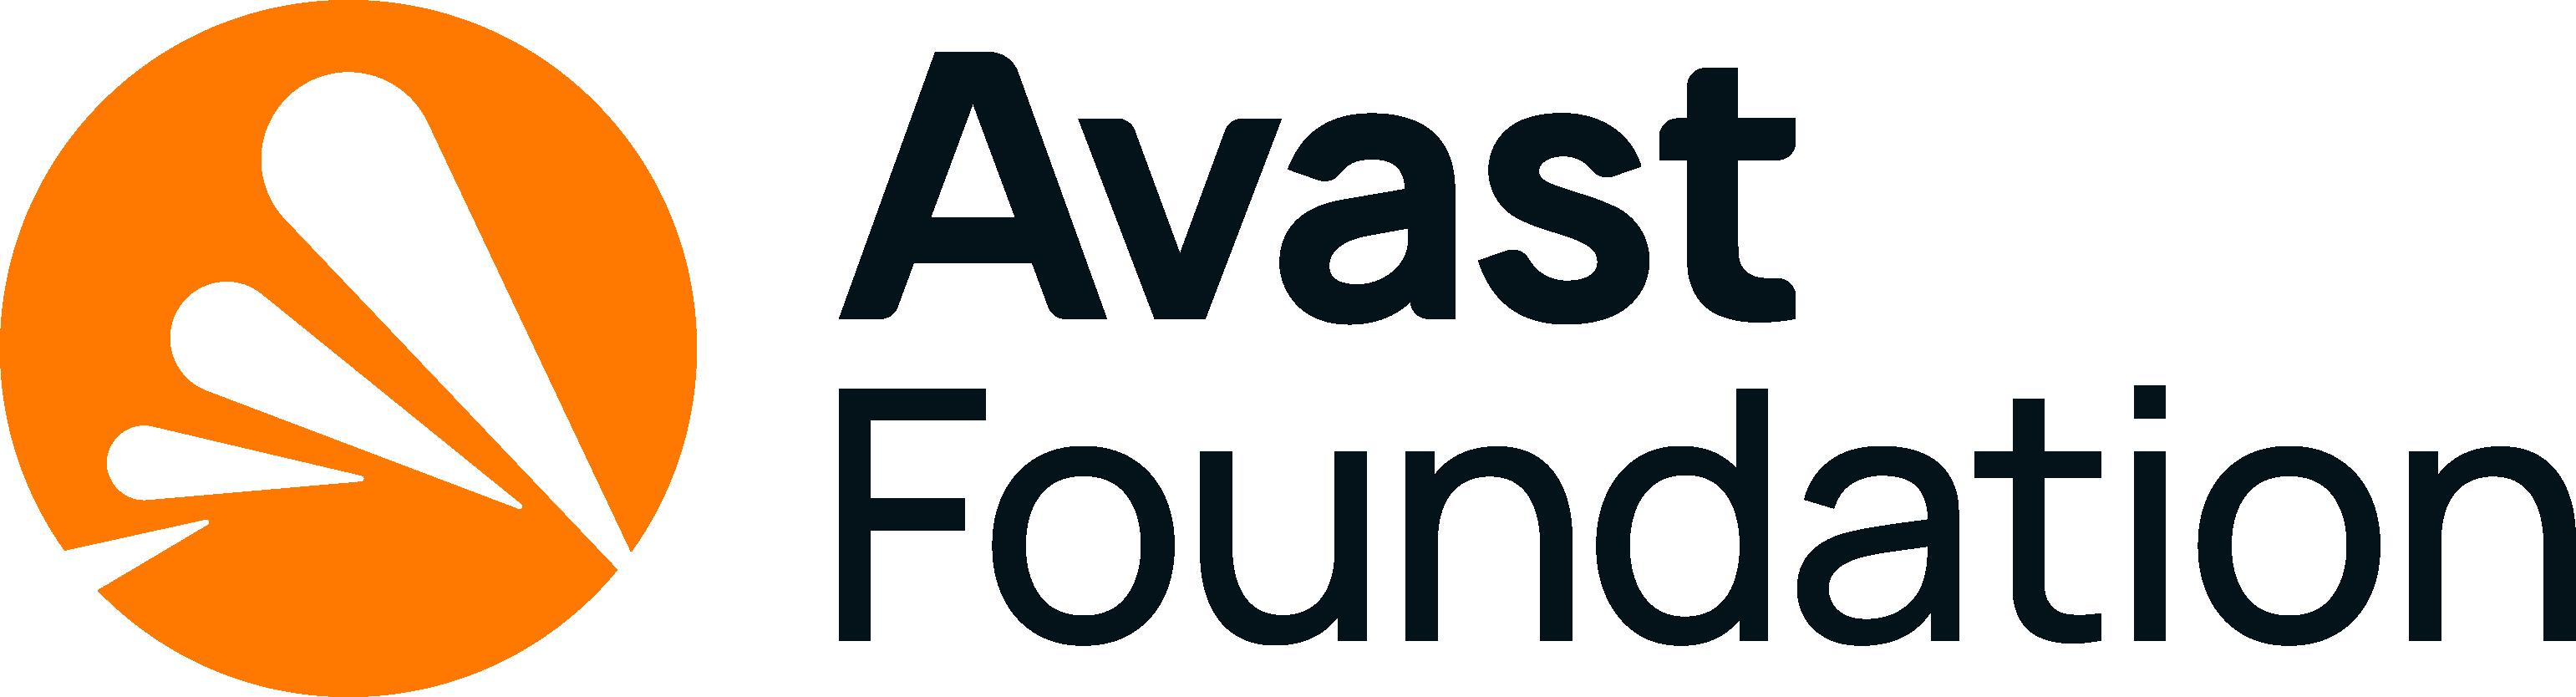 Avast Foundation